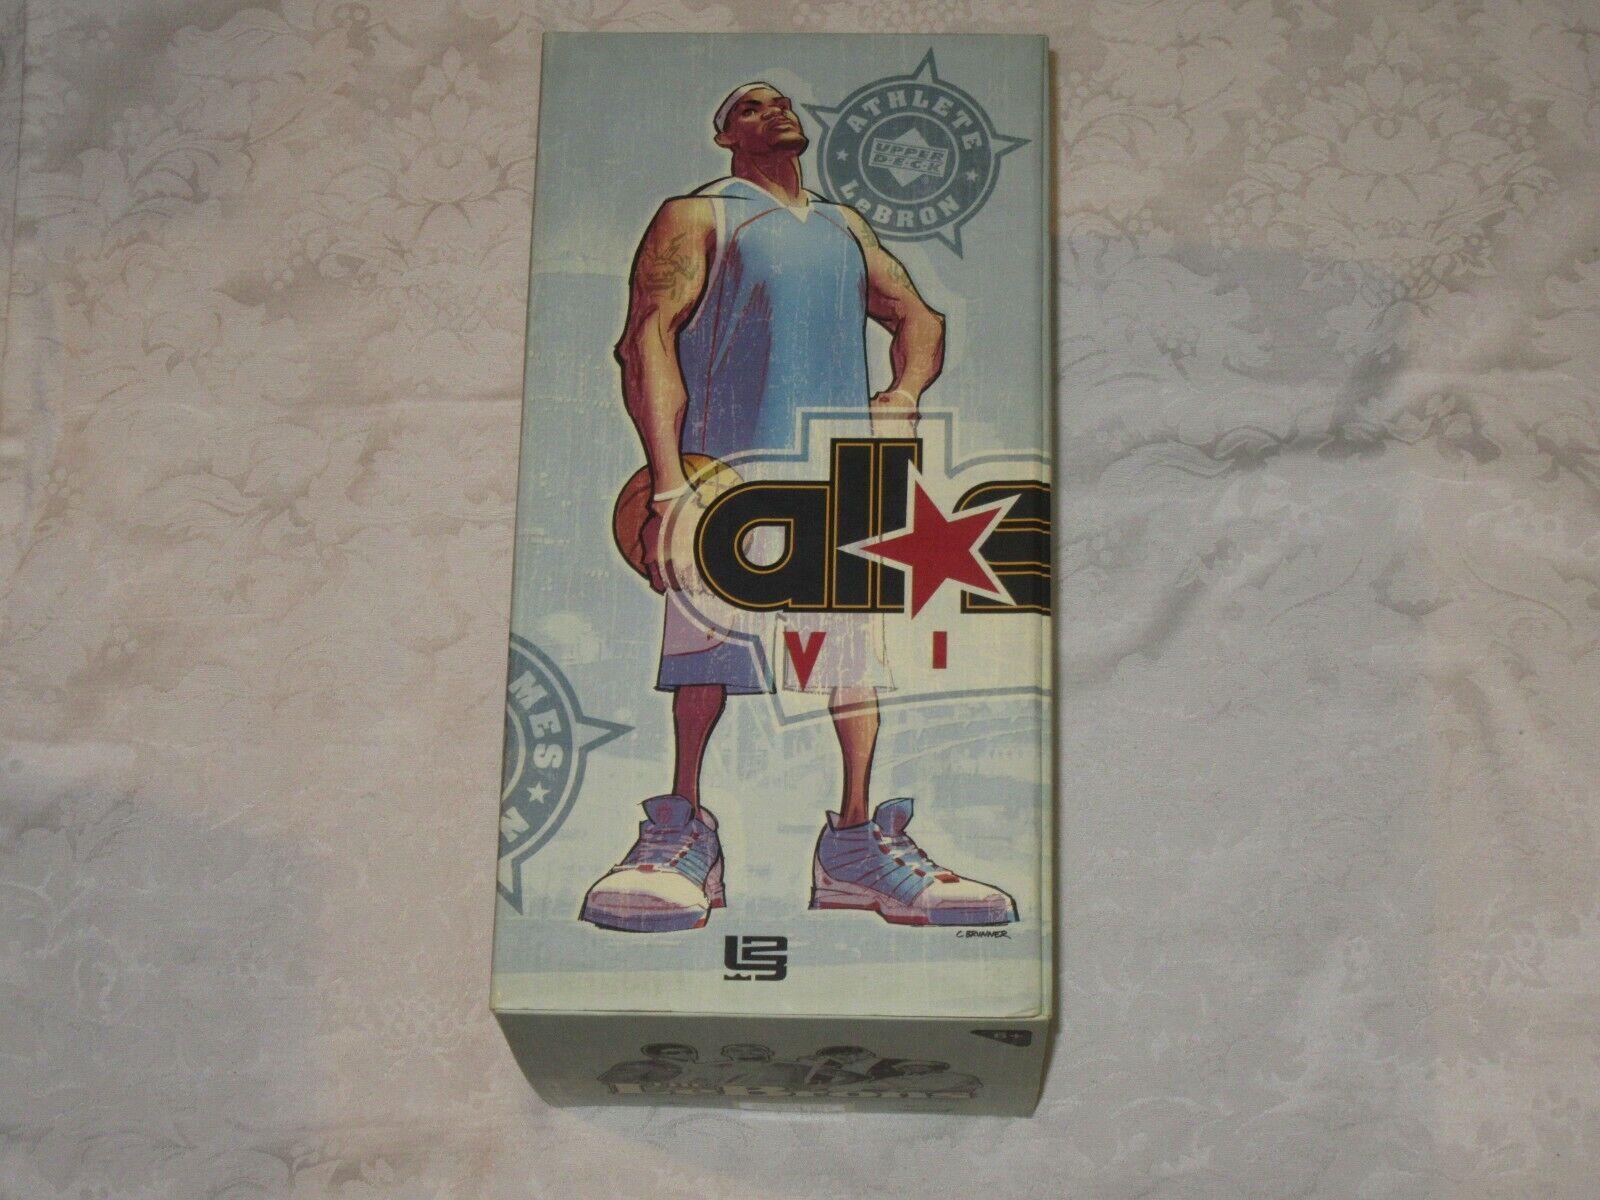 All Star Vinyl NBA The Lebrons 2006 King James Edition AP 1 124 Athlete Lebron